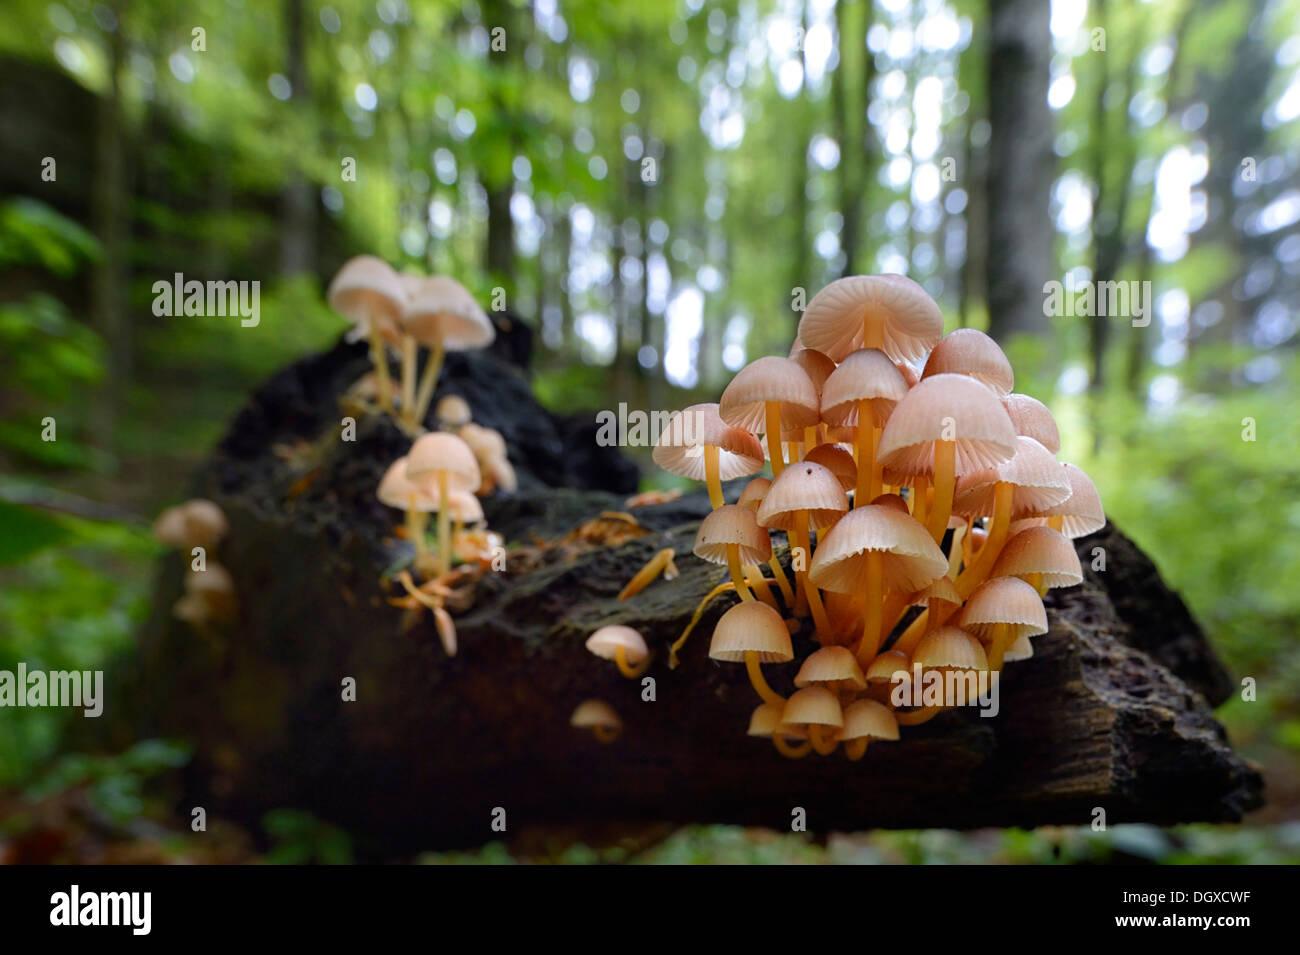 Clustered Bonnet or Oak-stump Bonnet Cap (Mycena inclinata), fruiting bodies on a tree trunk in a beech forest, Obergünzburg - Stock Image